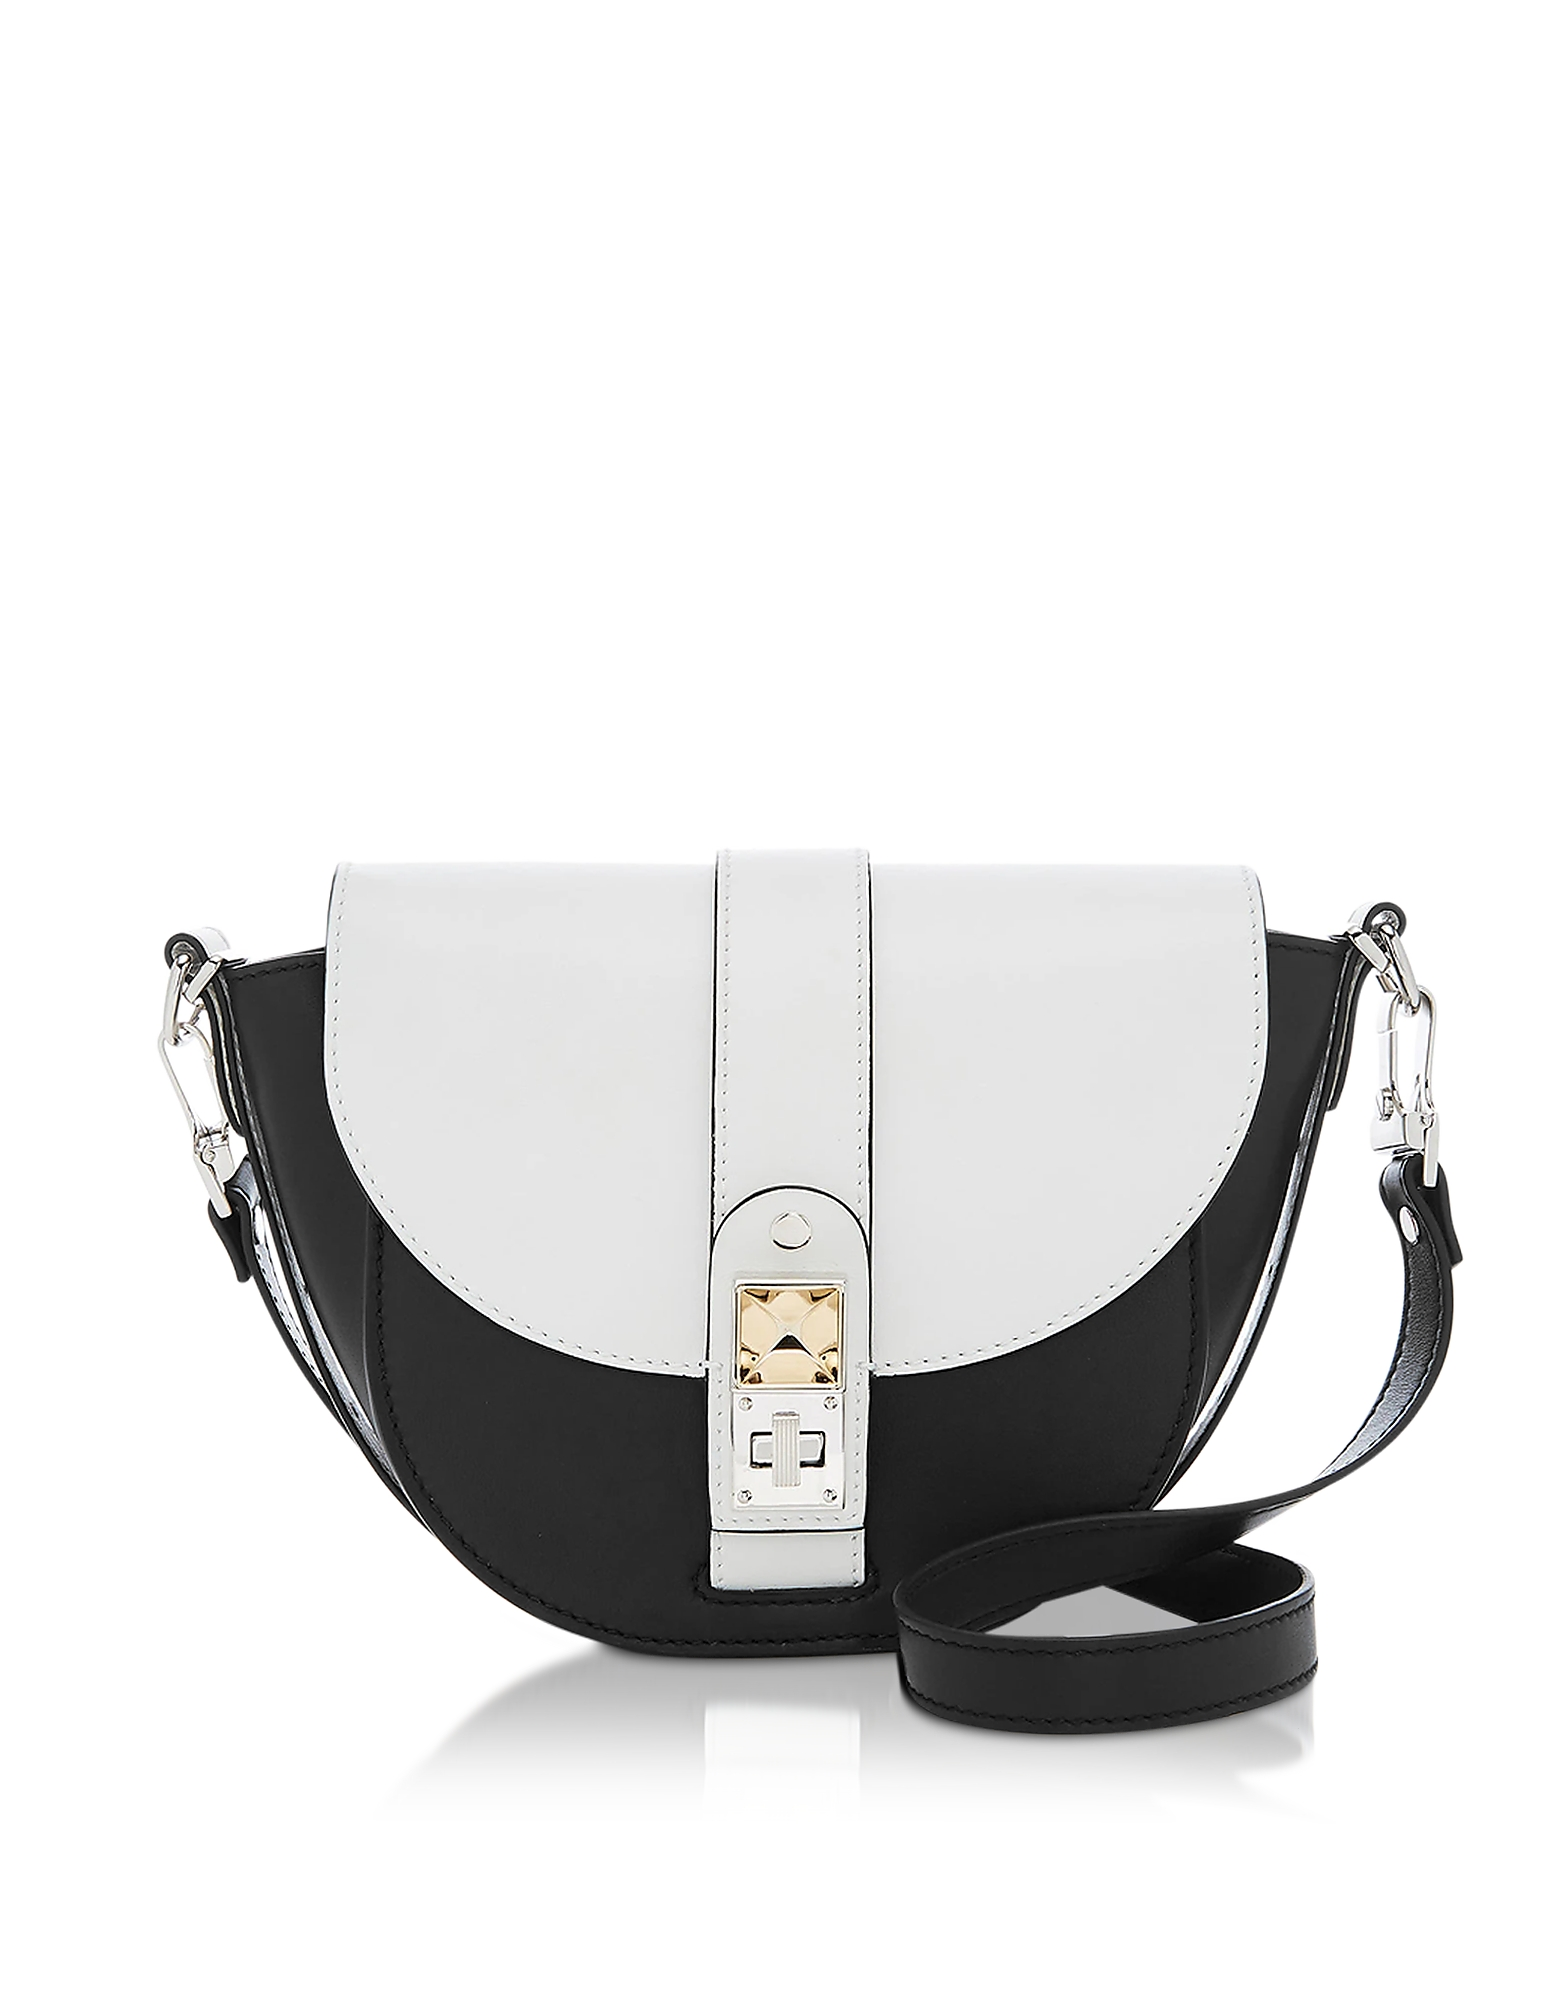 Optic White/Black Leather PS11 Small Saddle Bag